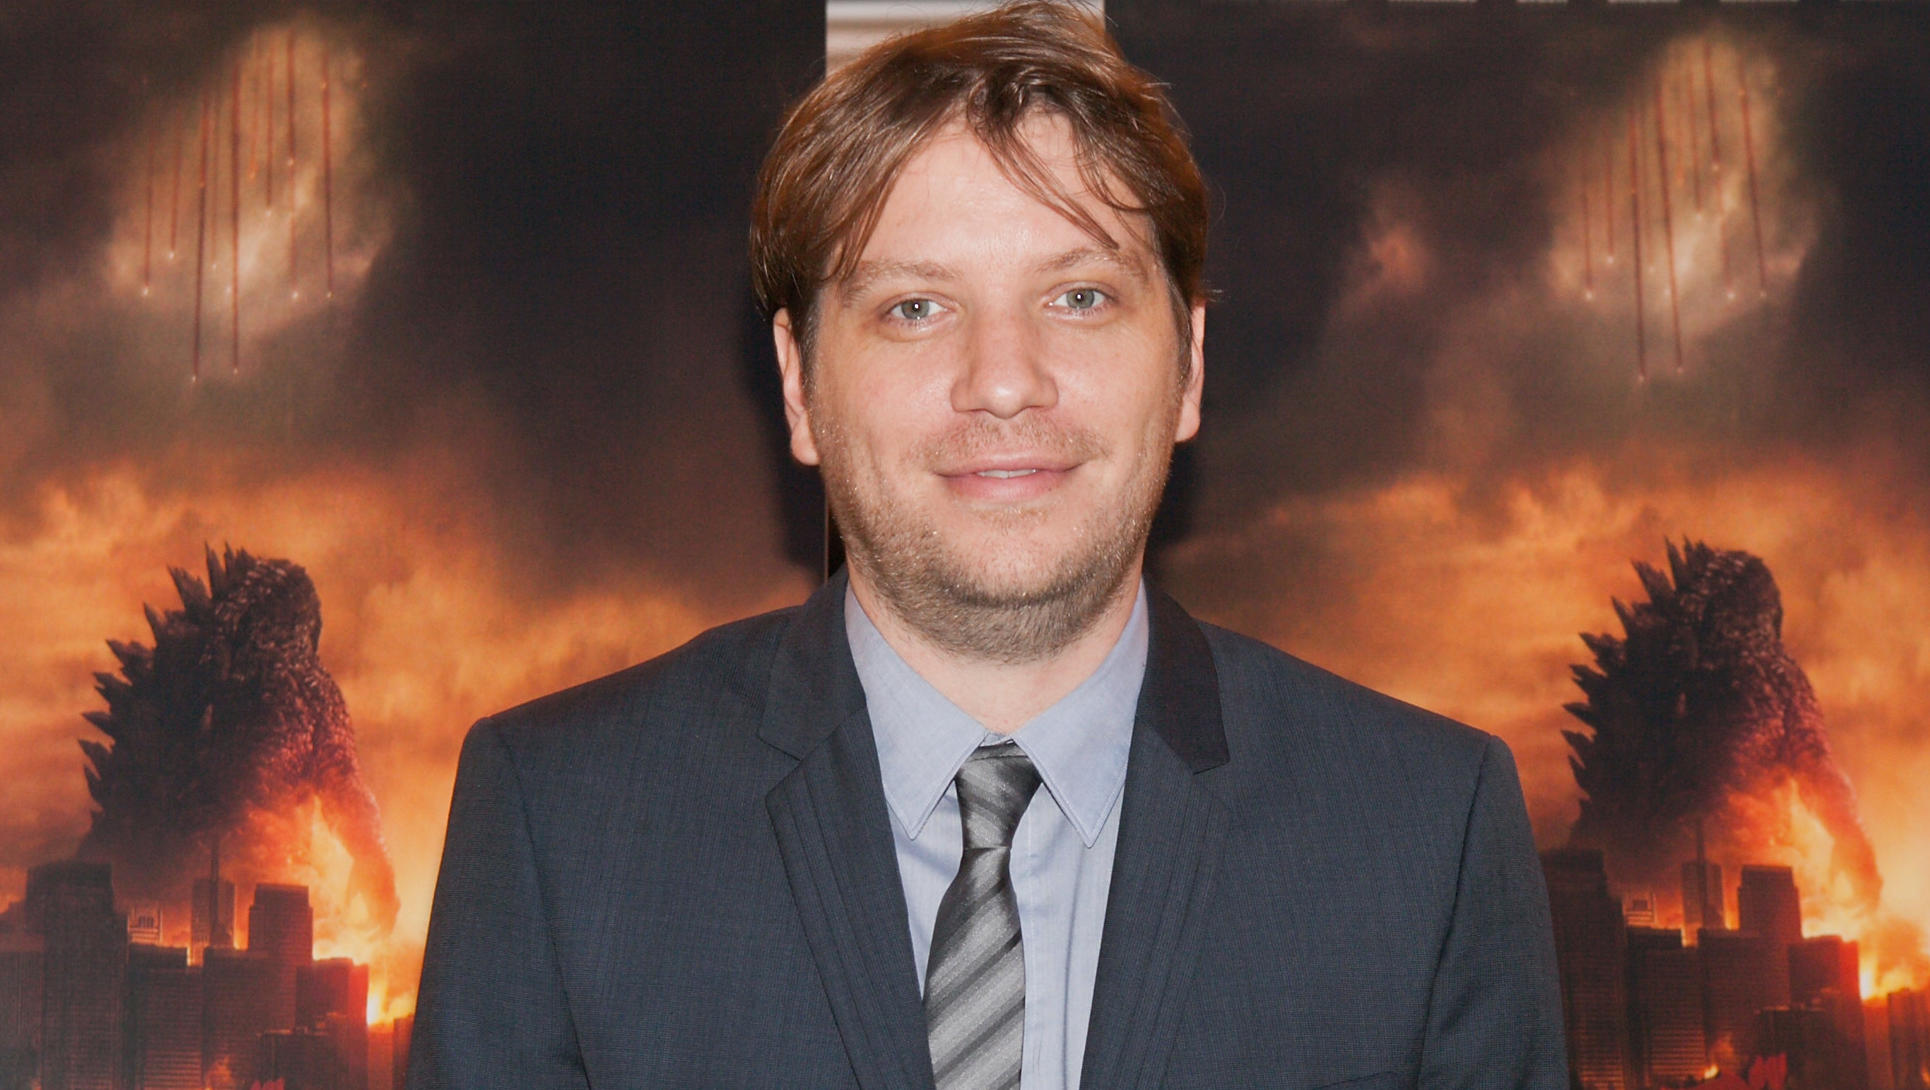 490625557 Godzilla Filmmaker To Helm Star Wars Spinoff